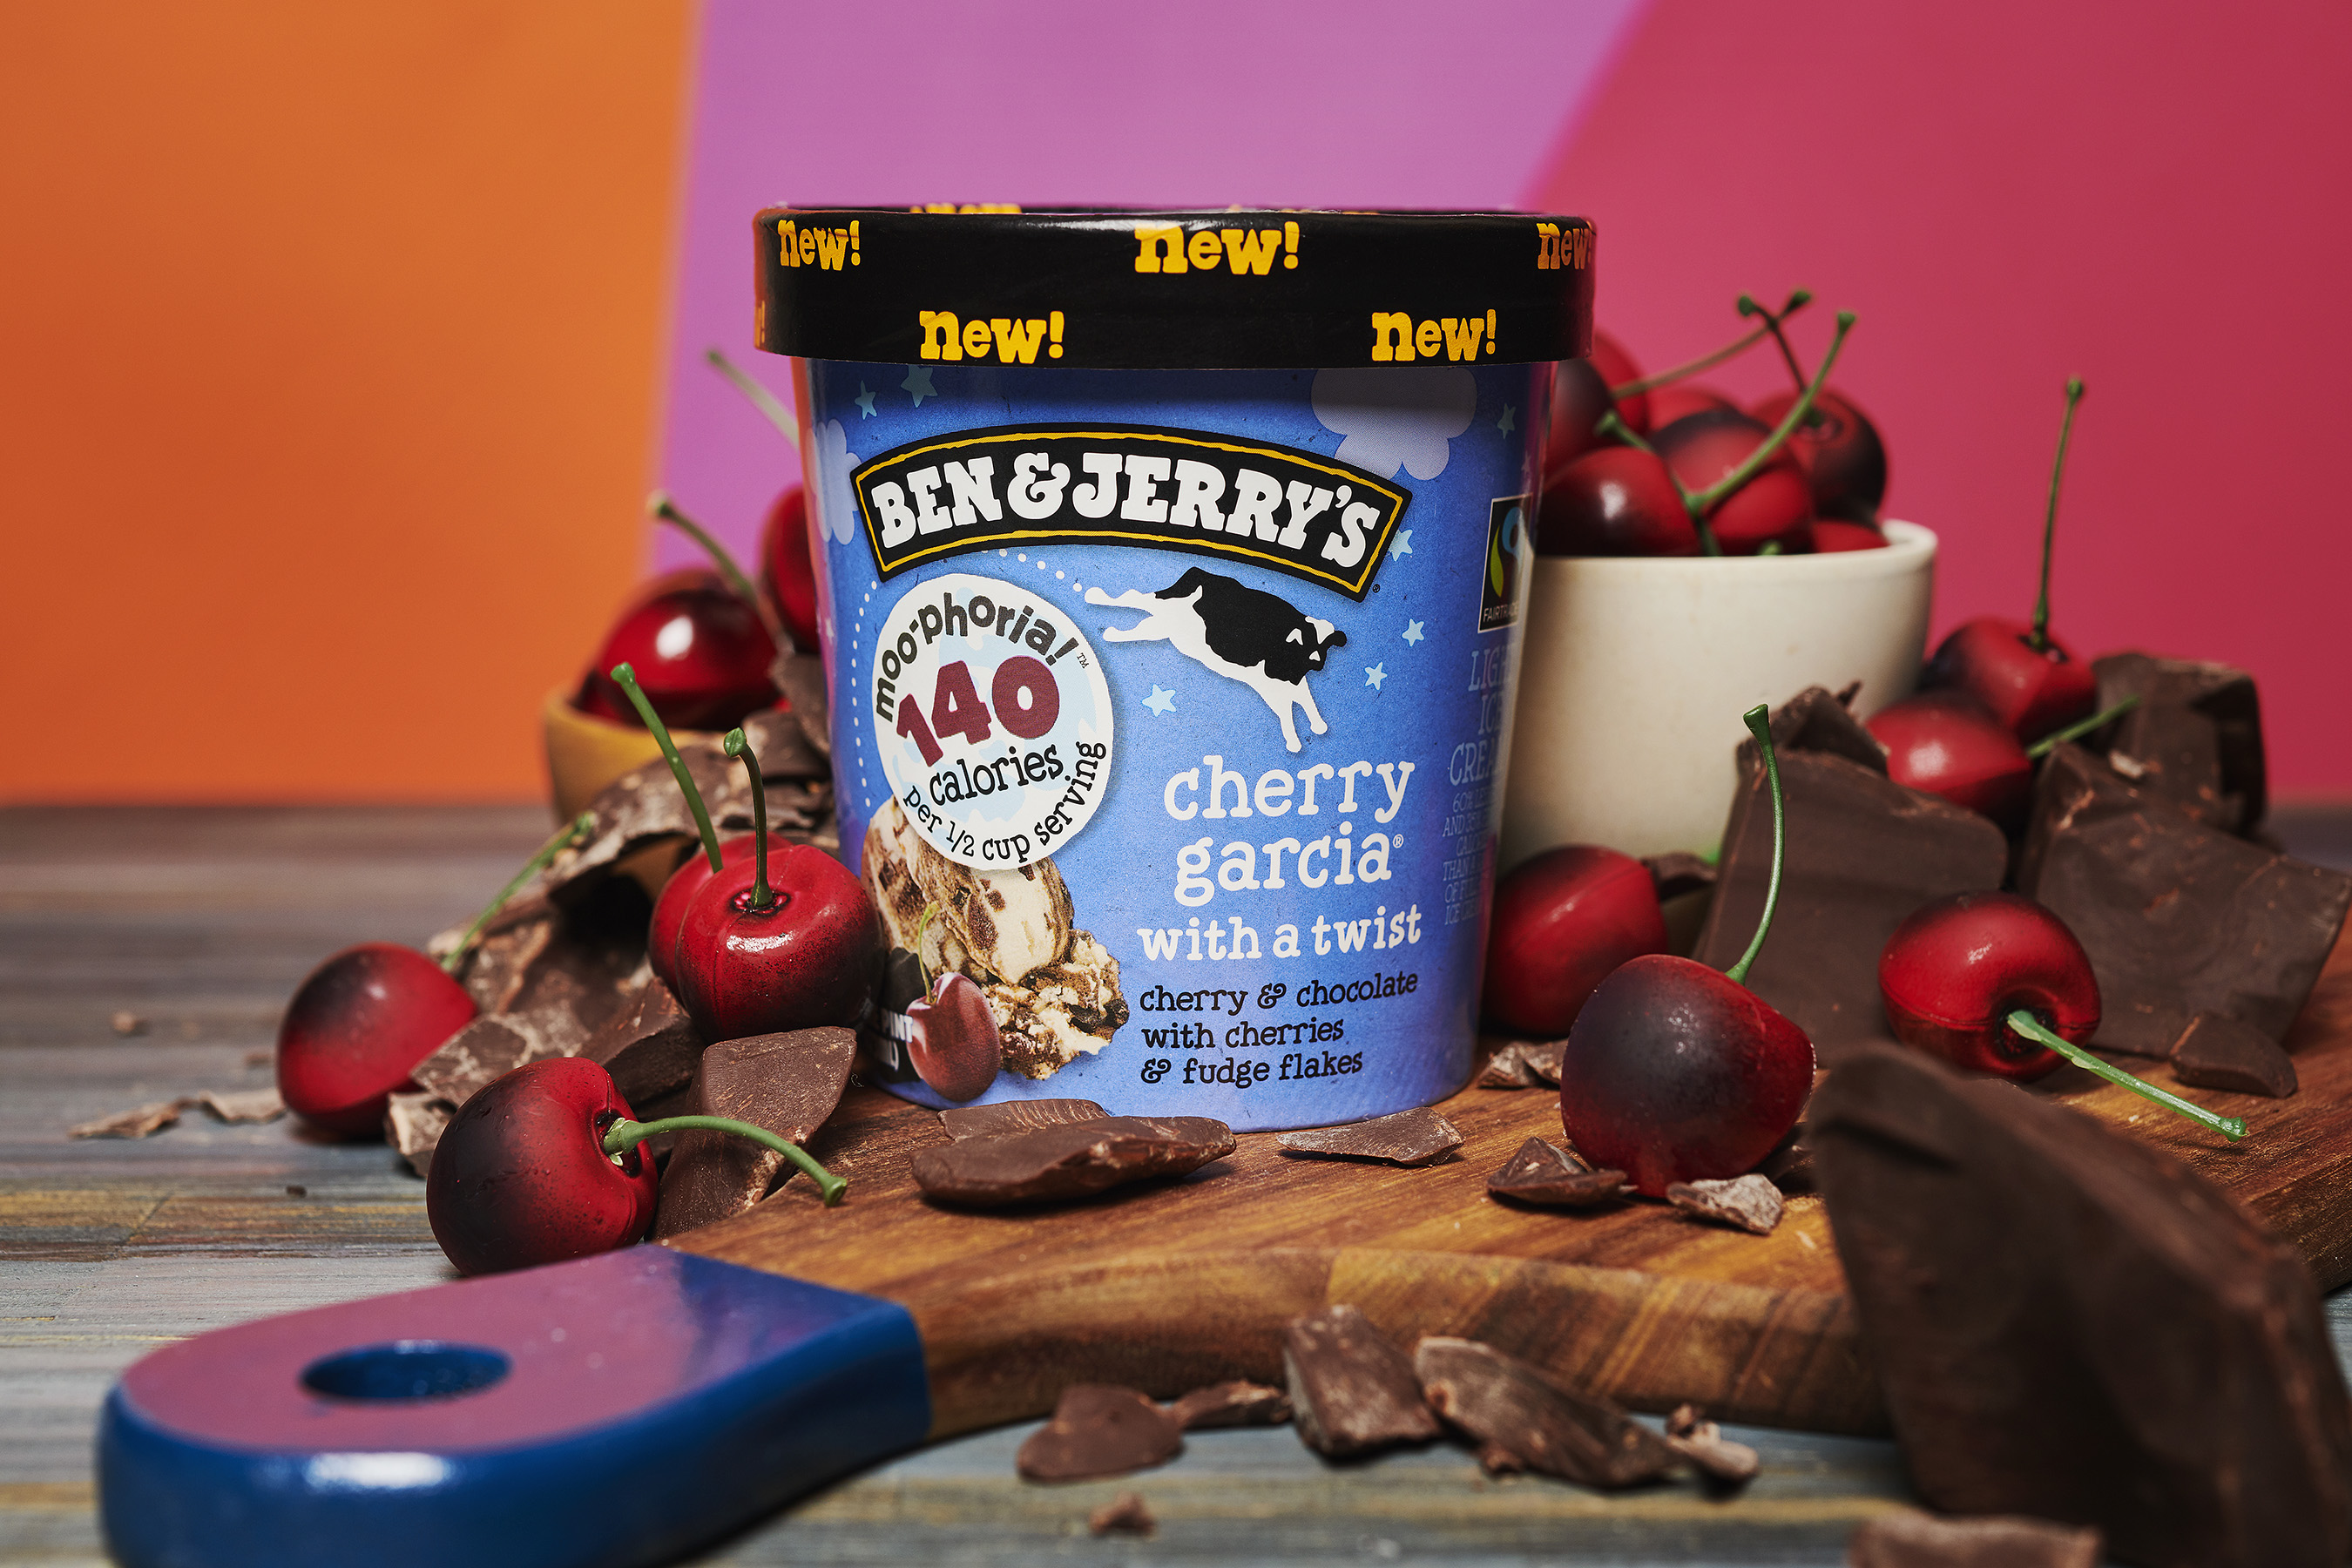 Lighten Up with Four More Flavors of Ben & Jerry's Moo-phoria Light Ice Cream